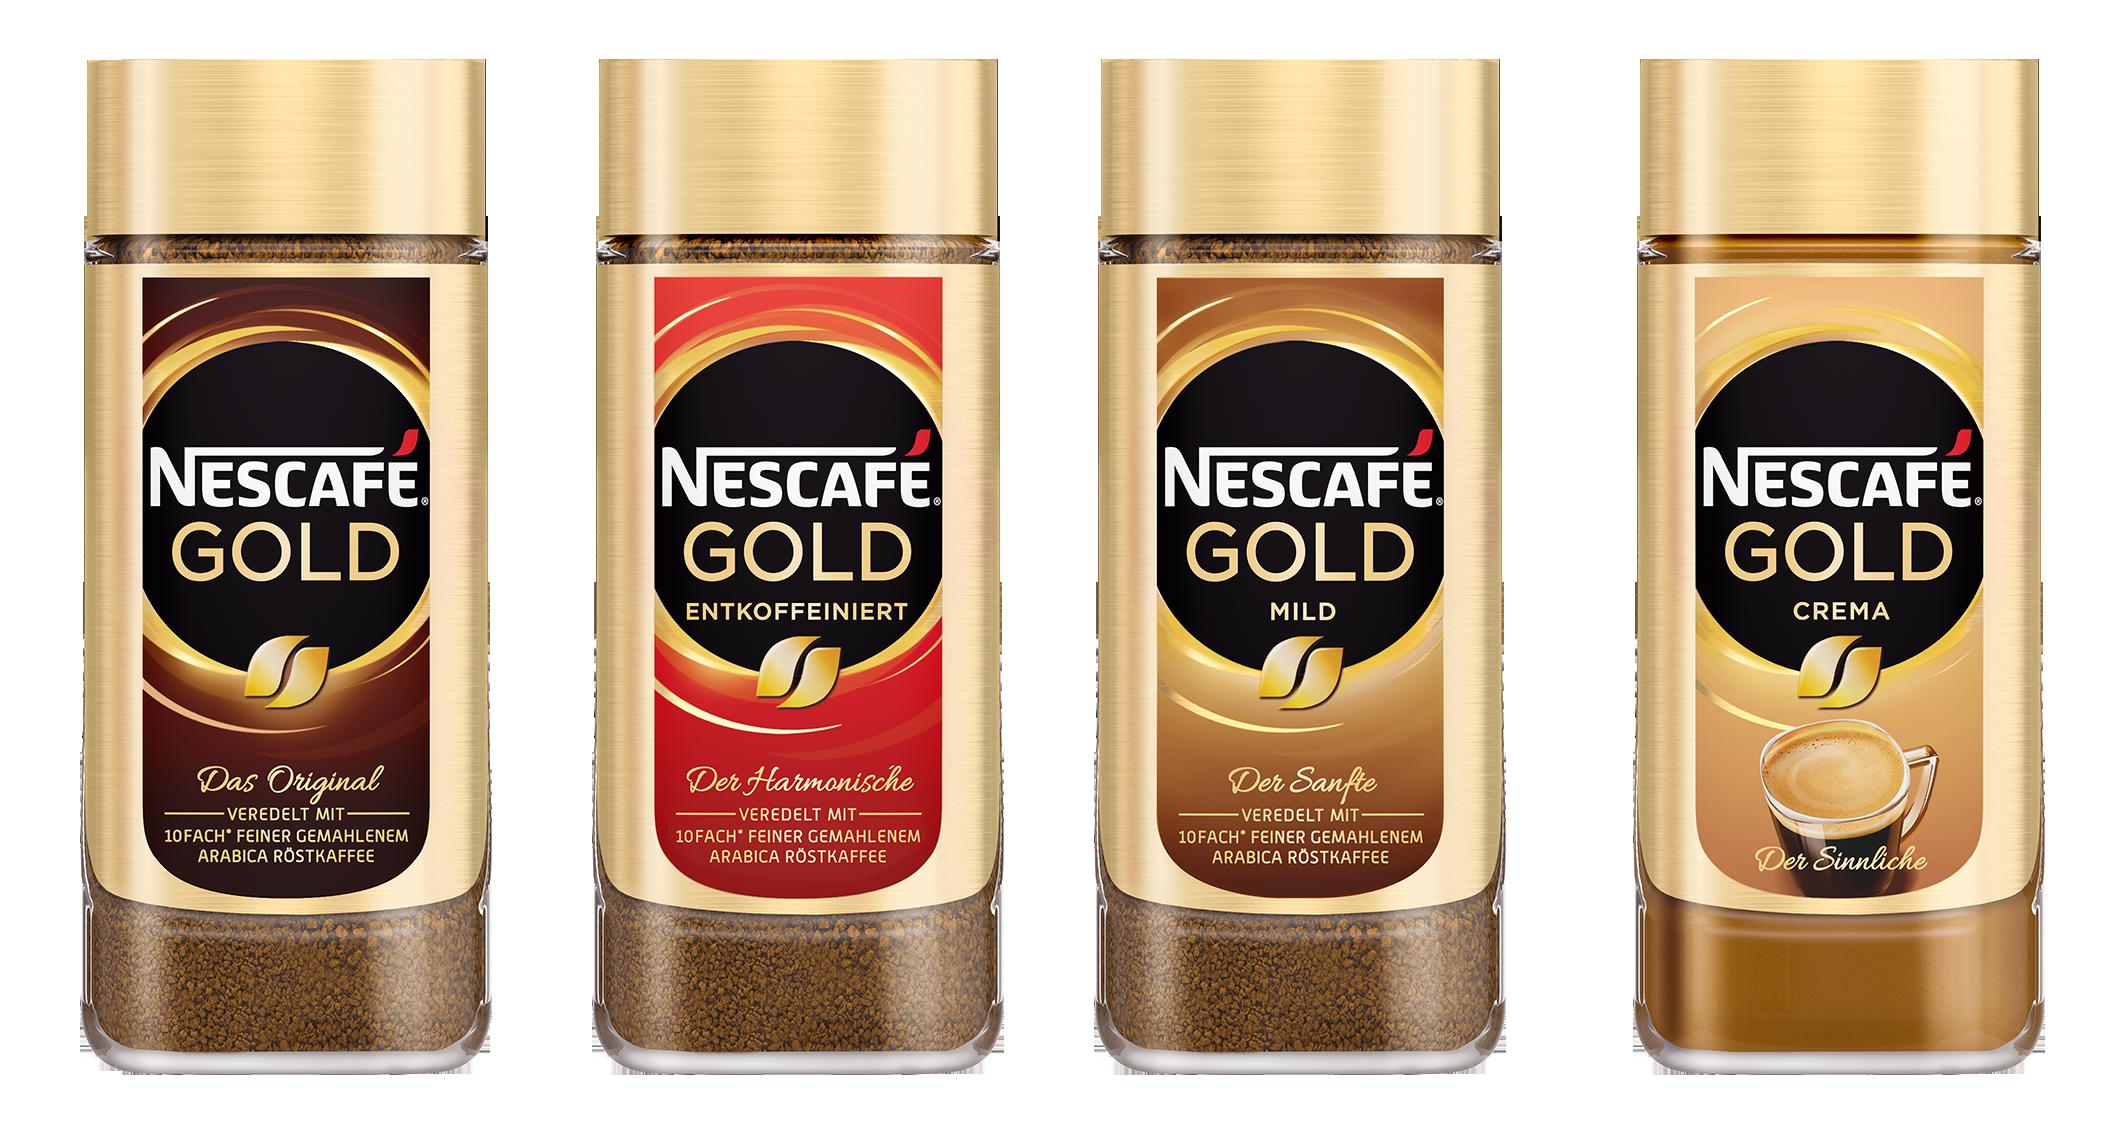 Tempat Jual Nescafe Gold White Coffee Terbaru 2018 Tas Fashion Import Ysbj4866black Nescaf Range